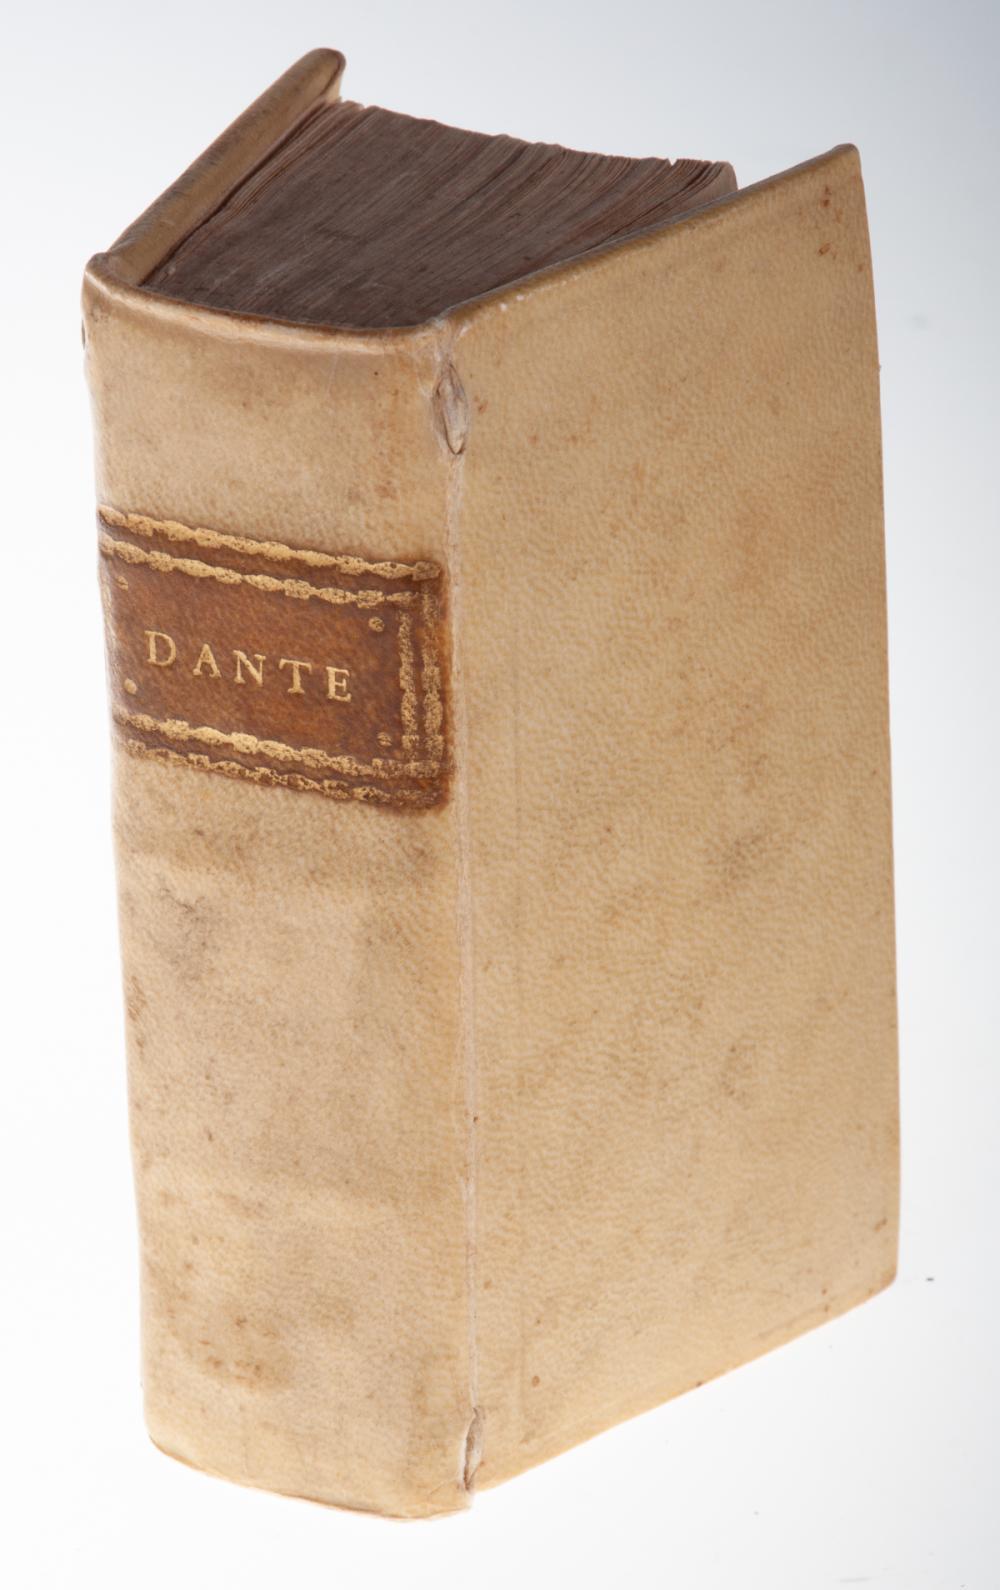 "Dante 1629 ""La Divina Comedia"", N. Misserini Pub."